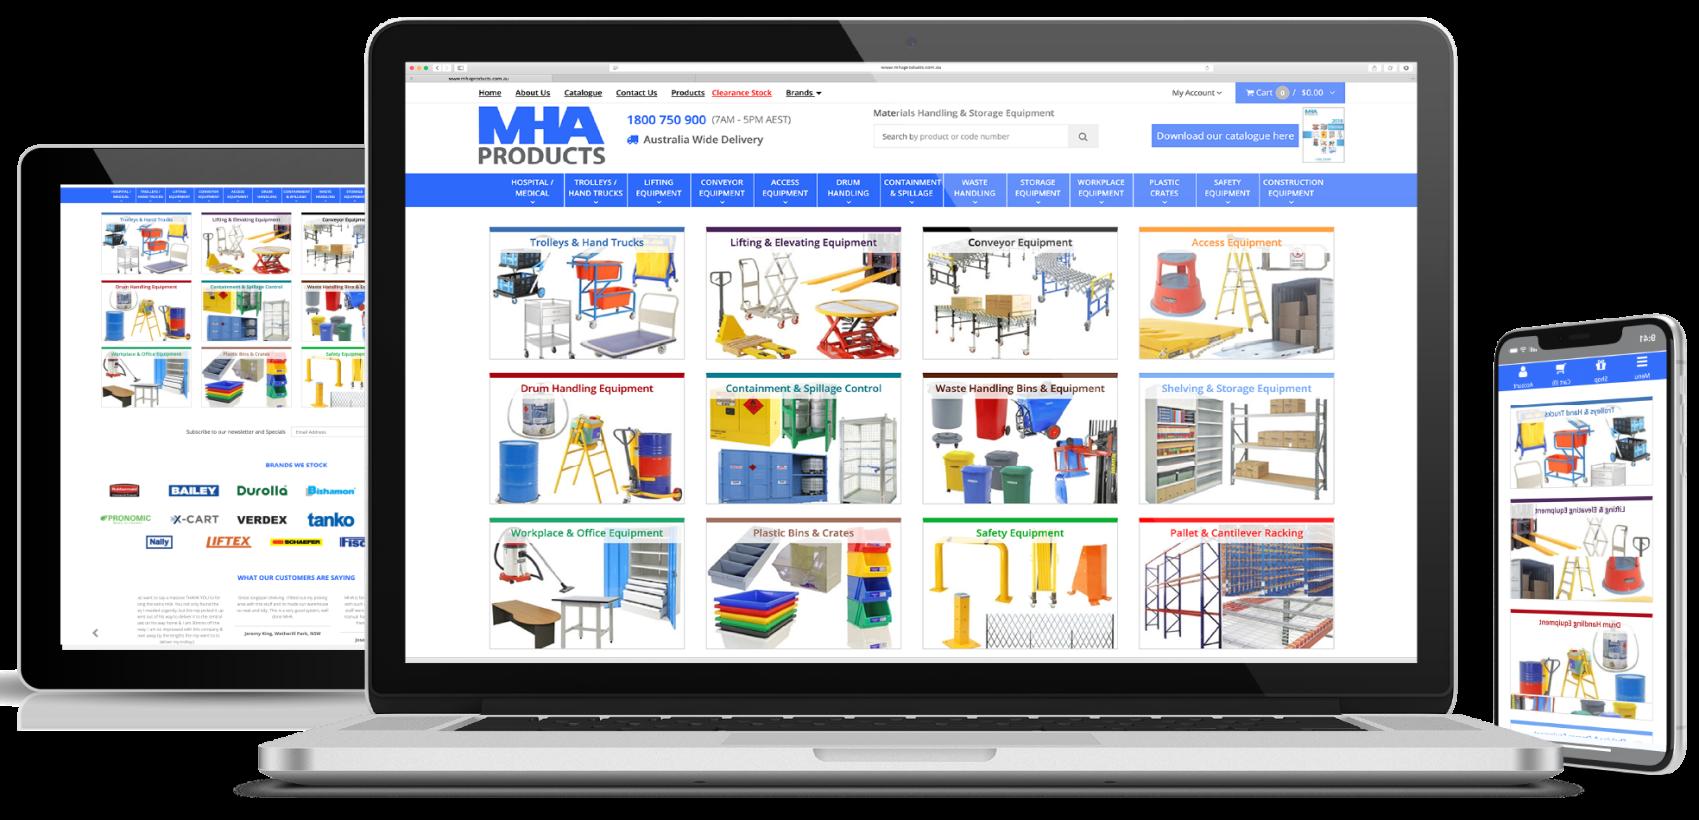 MHA Products